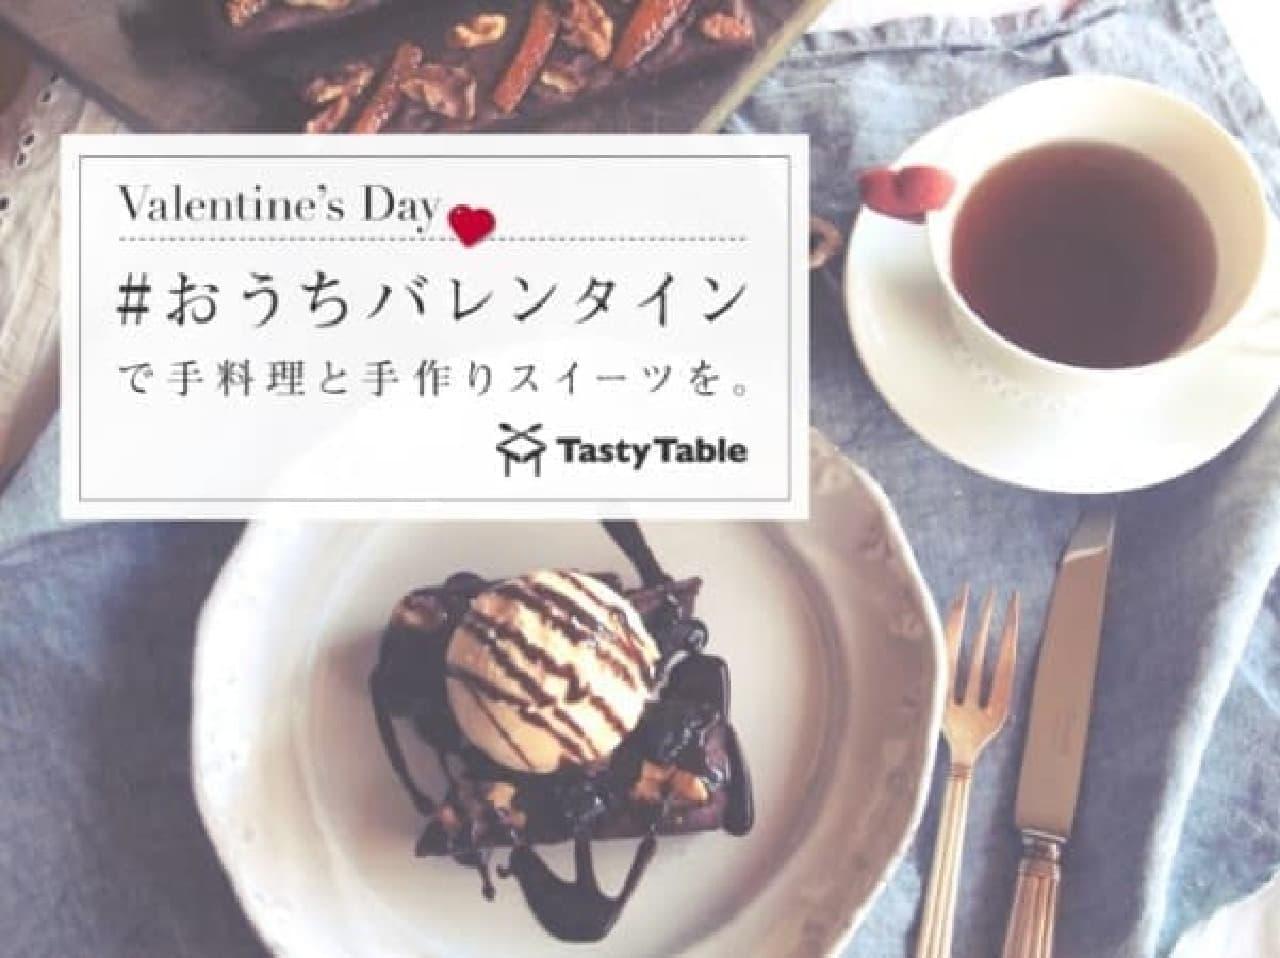 「TastyTable」バレンタイン限定特別プラン「おうちバレンタイン」キット